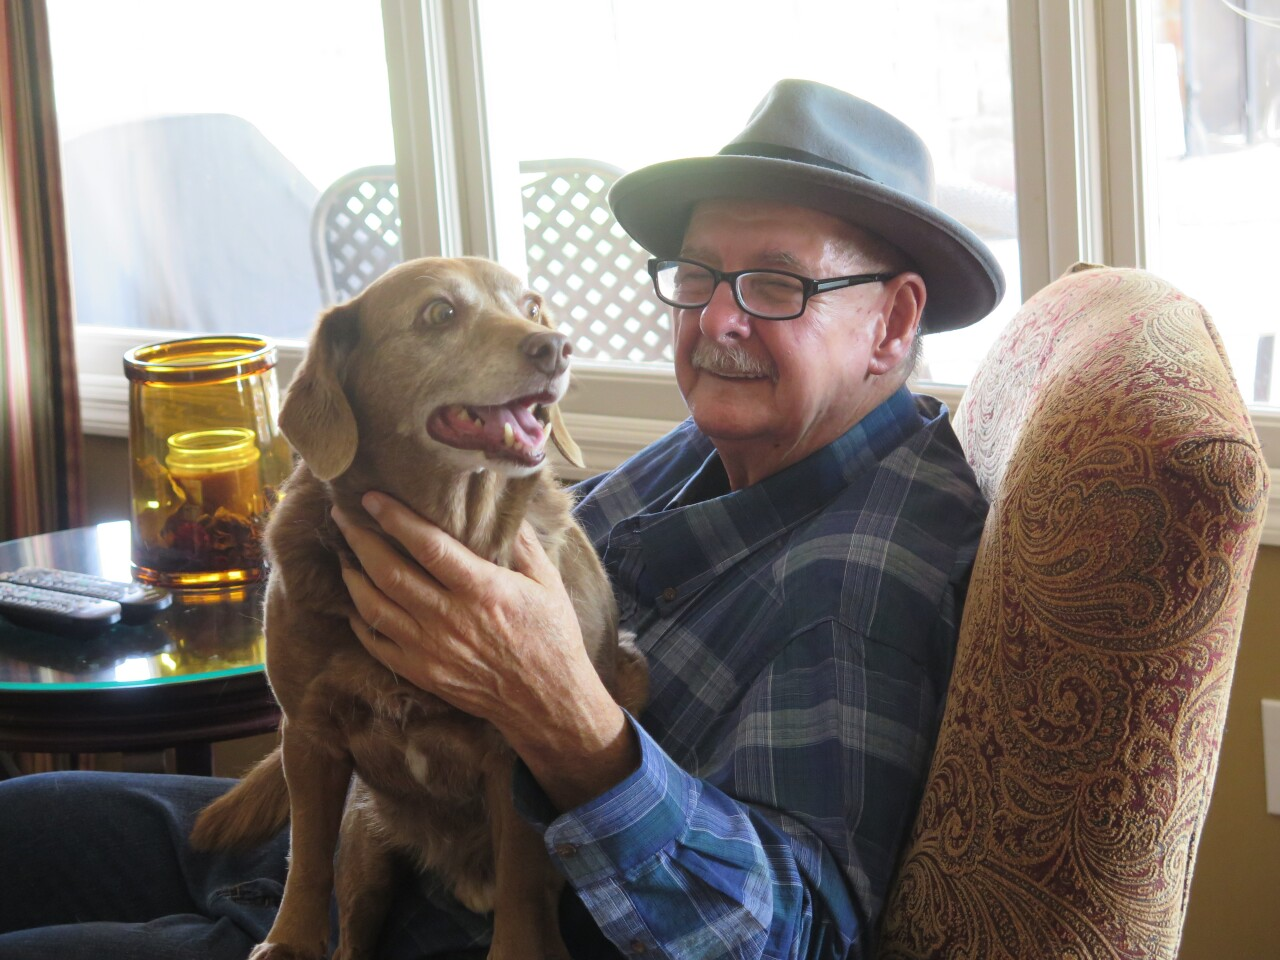 Terry_Walker_Sr_with_Brutus.JPG